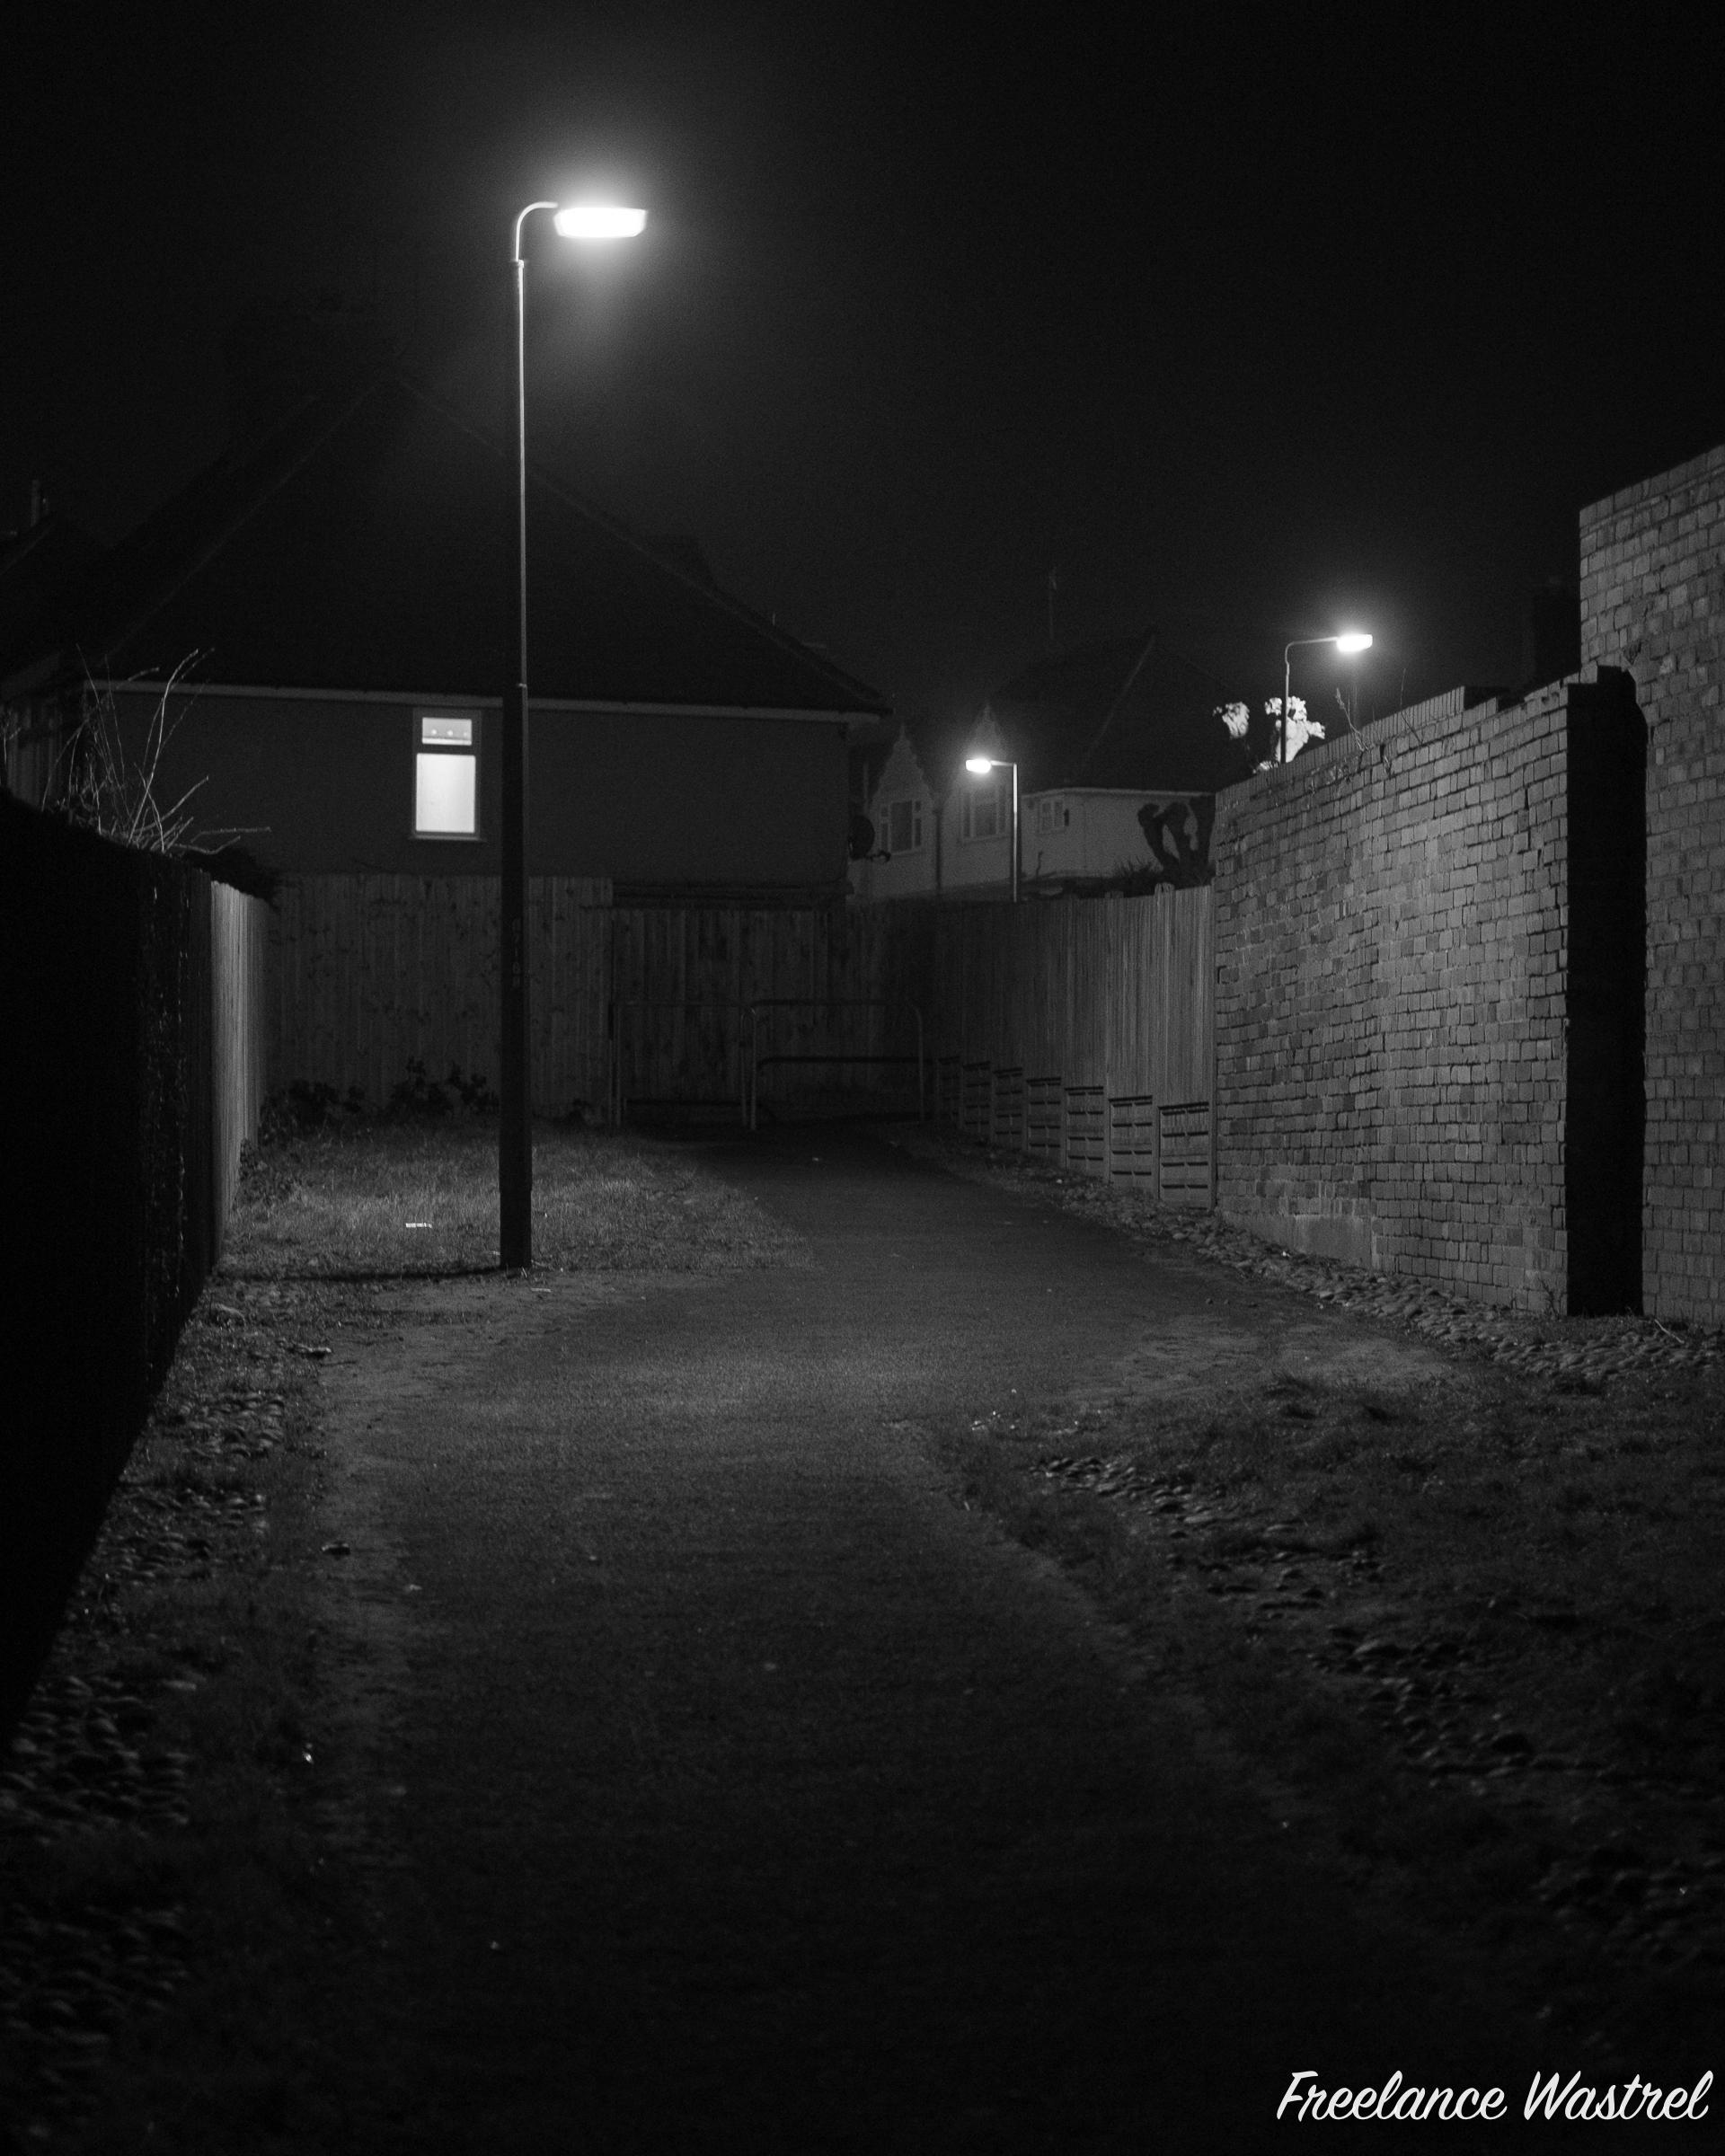 Alleyway, February 2015